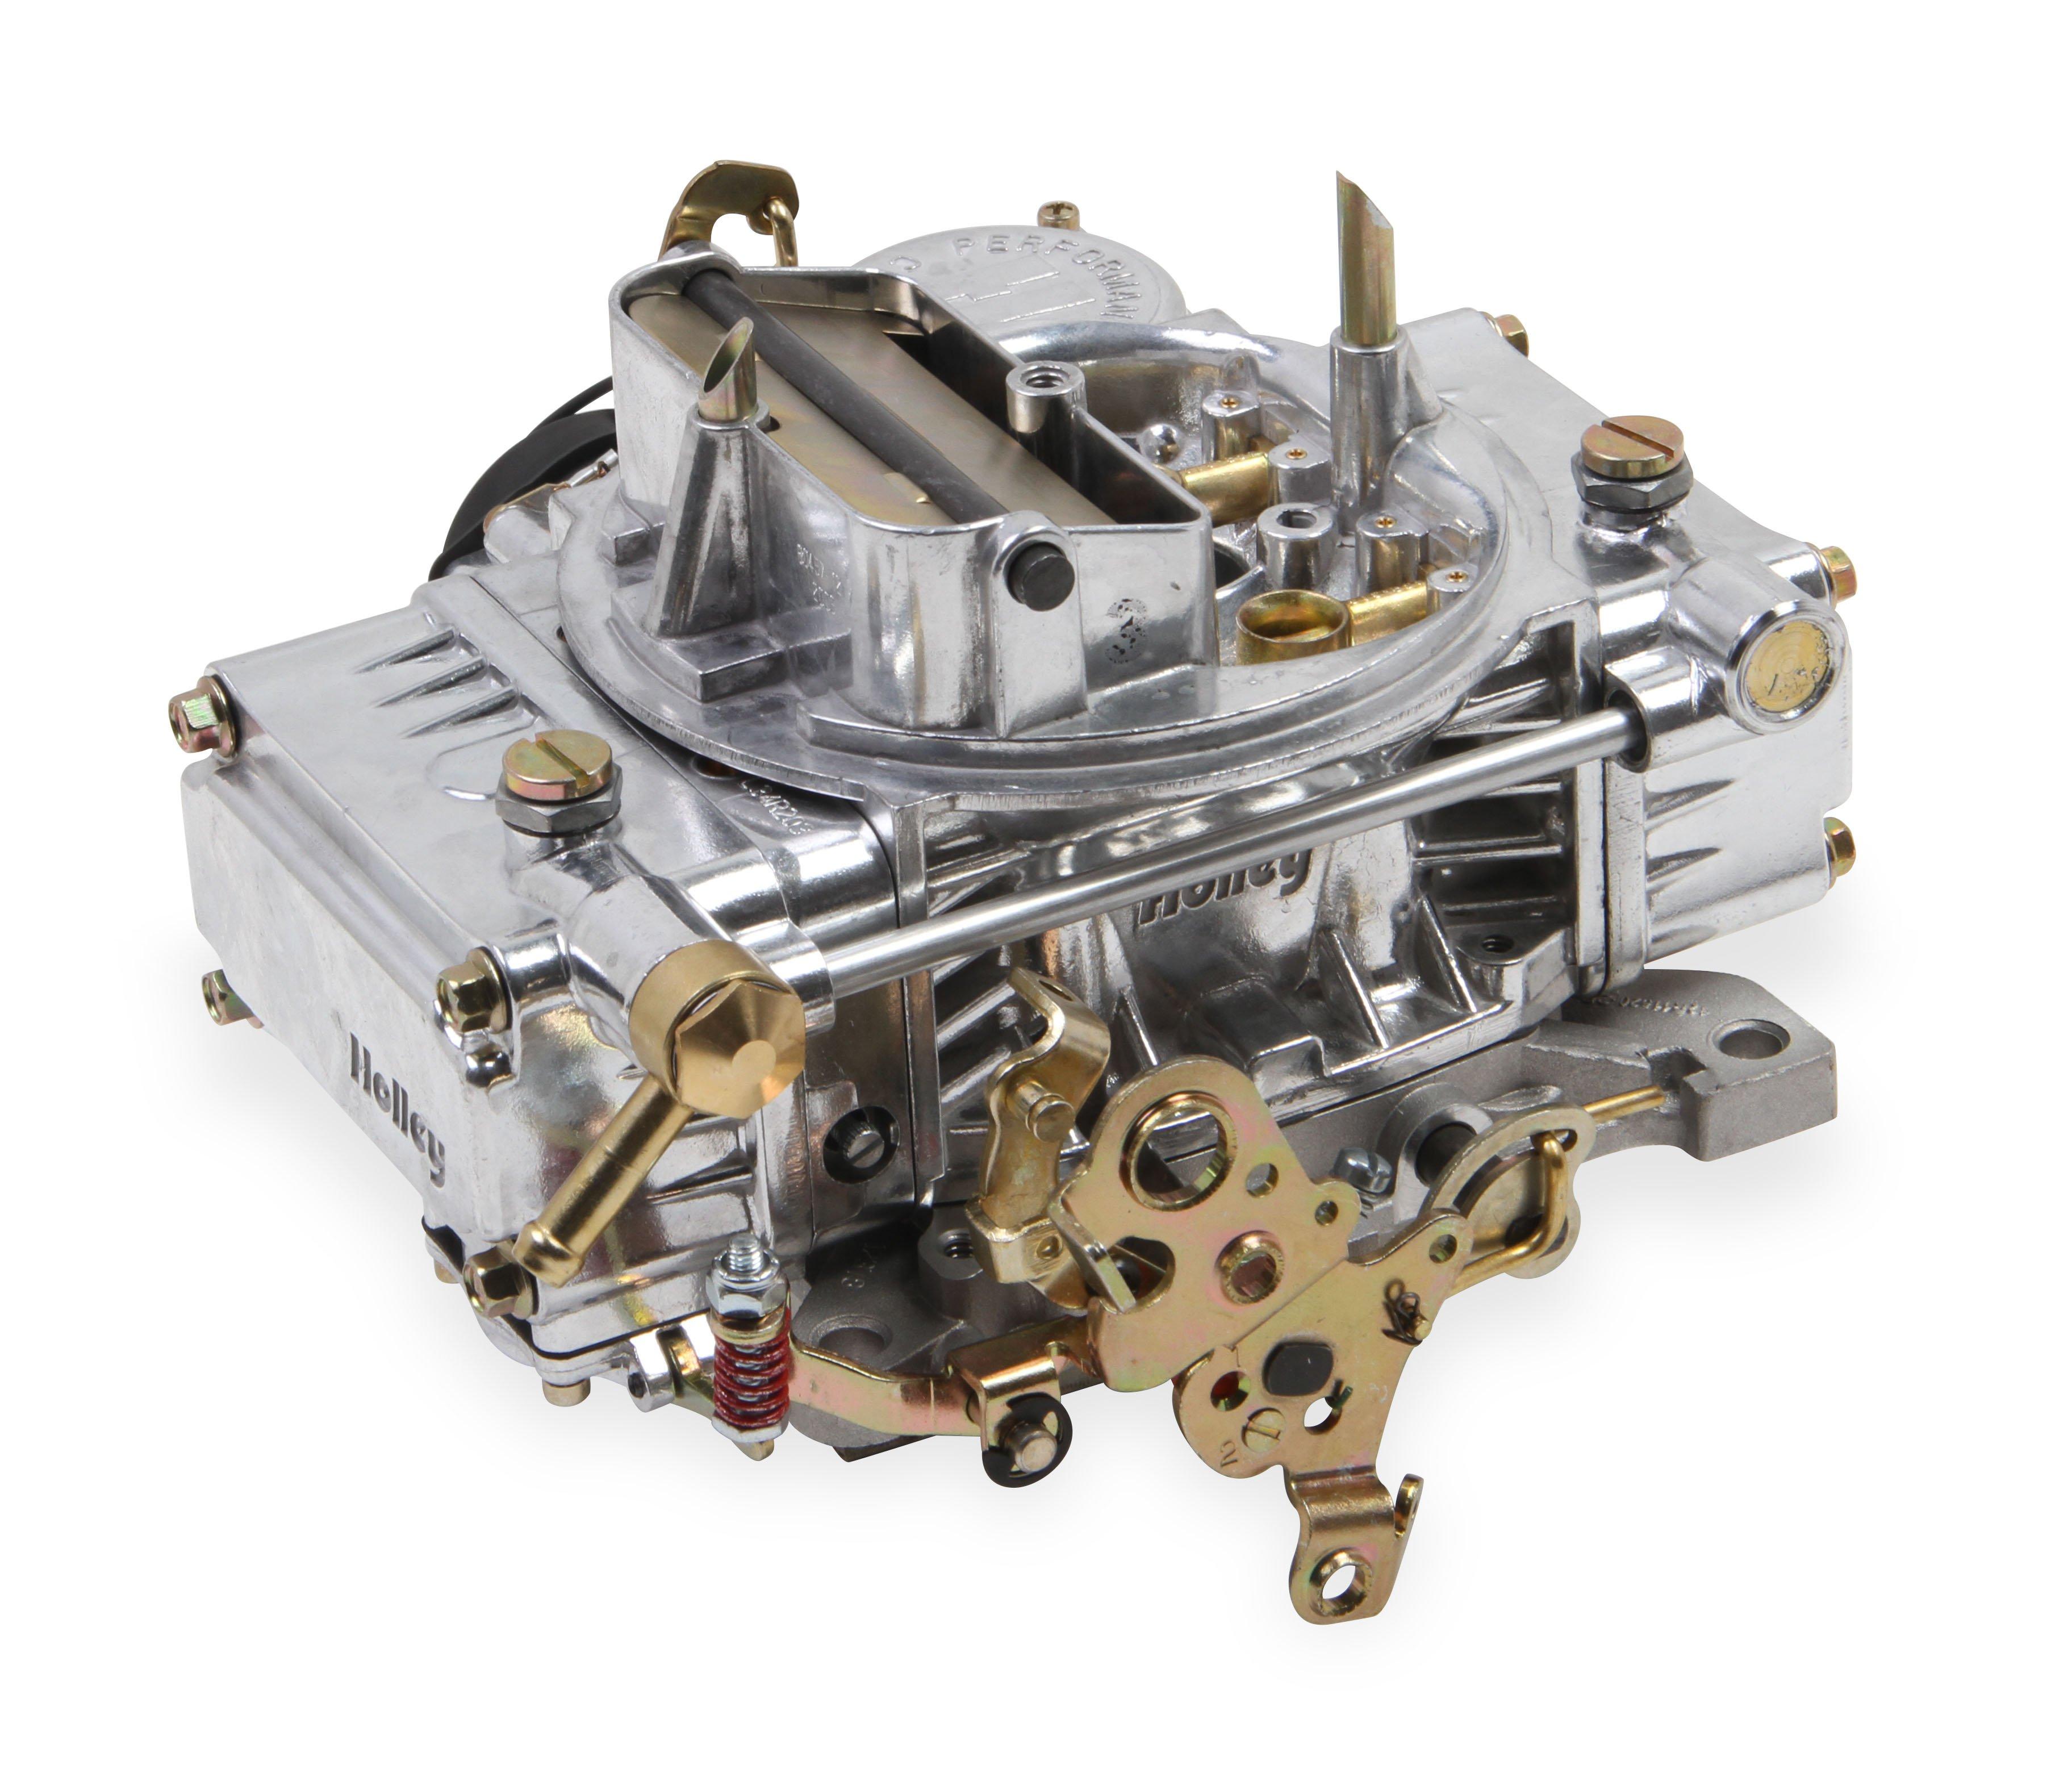 0-80457SA - 600 CFM Classic Holley Carburetor Image